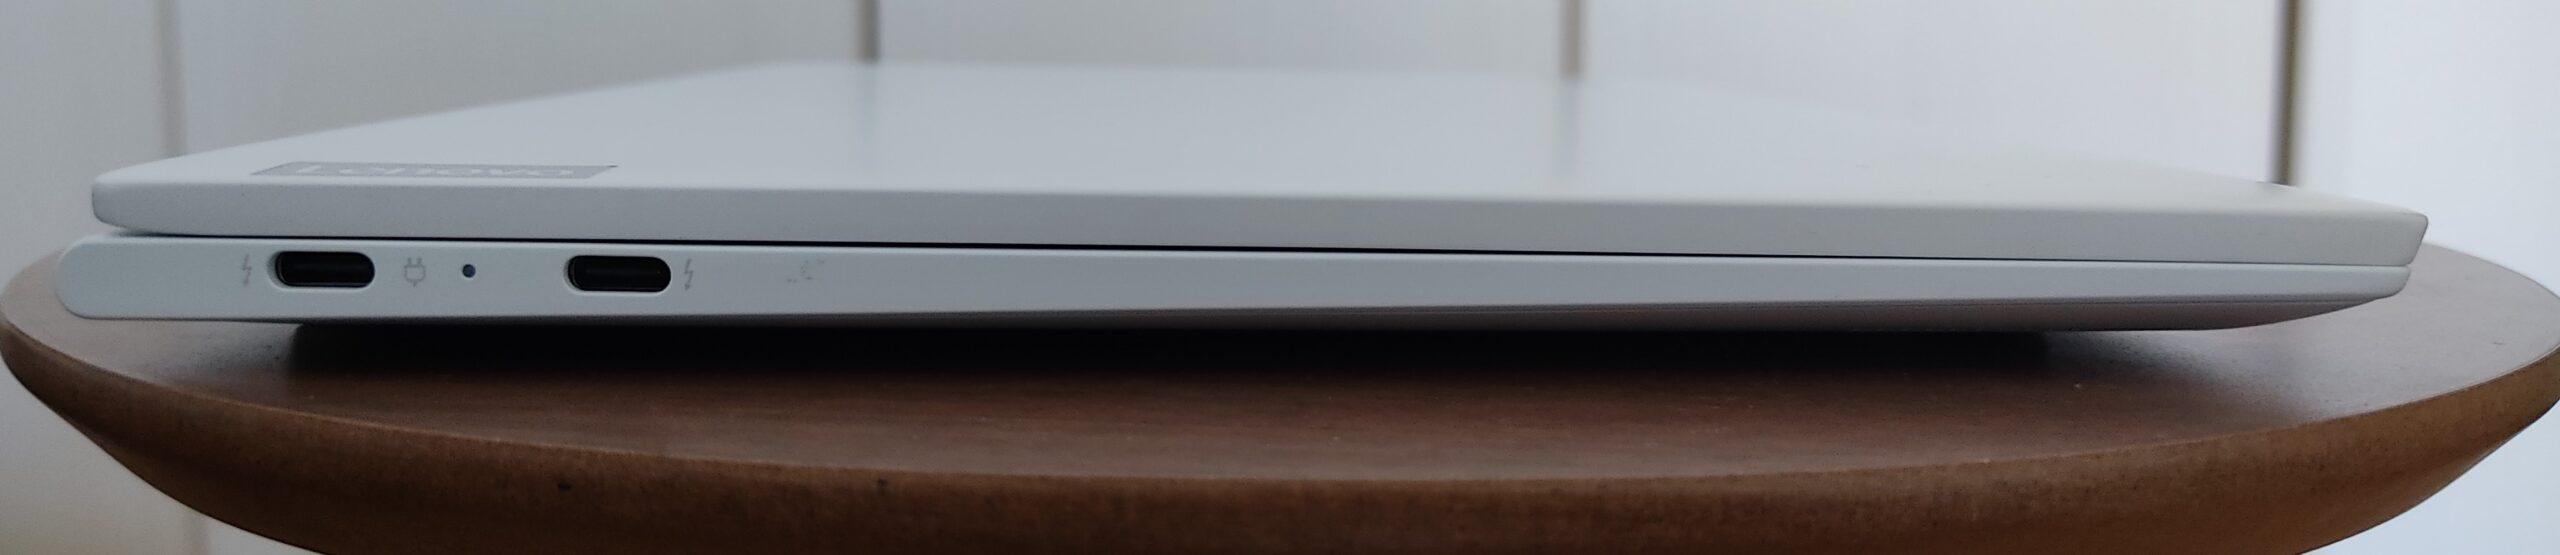 Lenovo Yoga Slim 750i Carbon 左側面